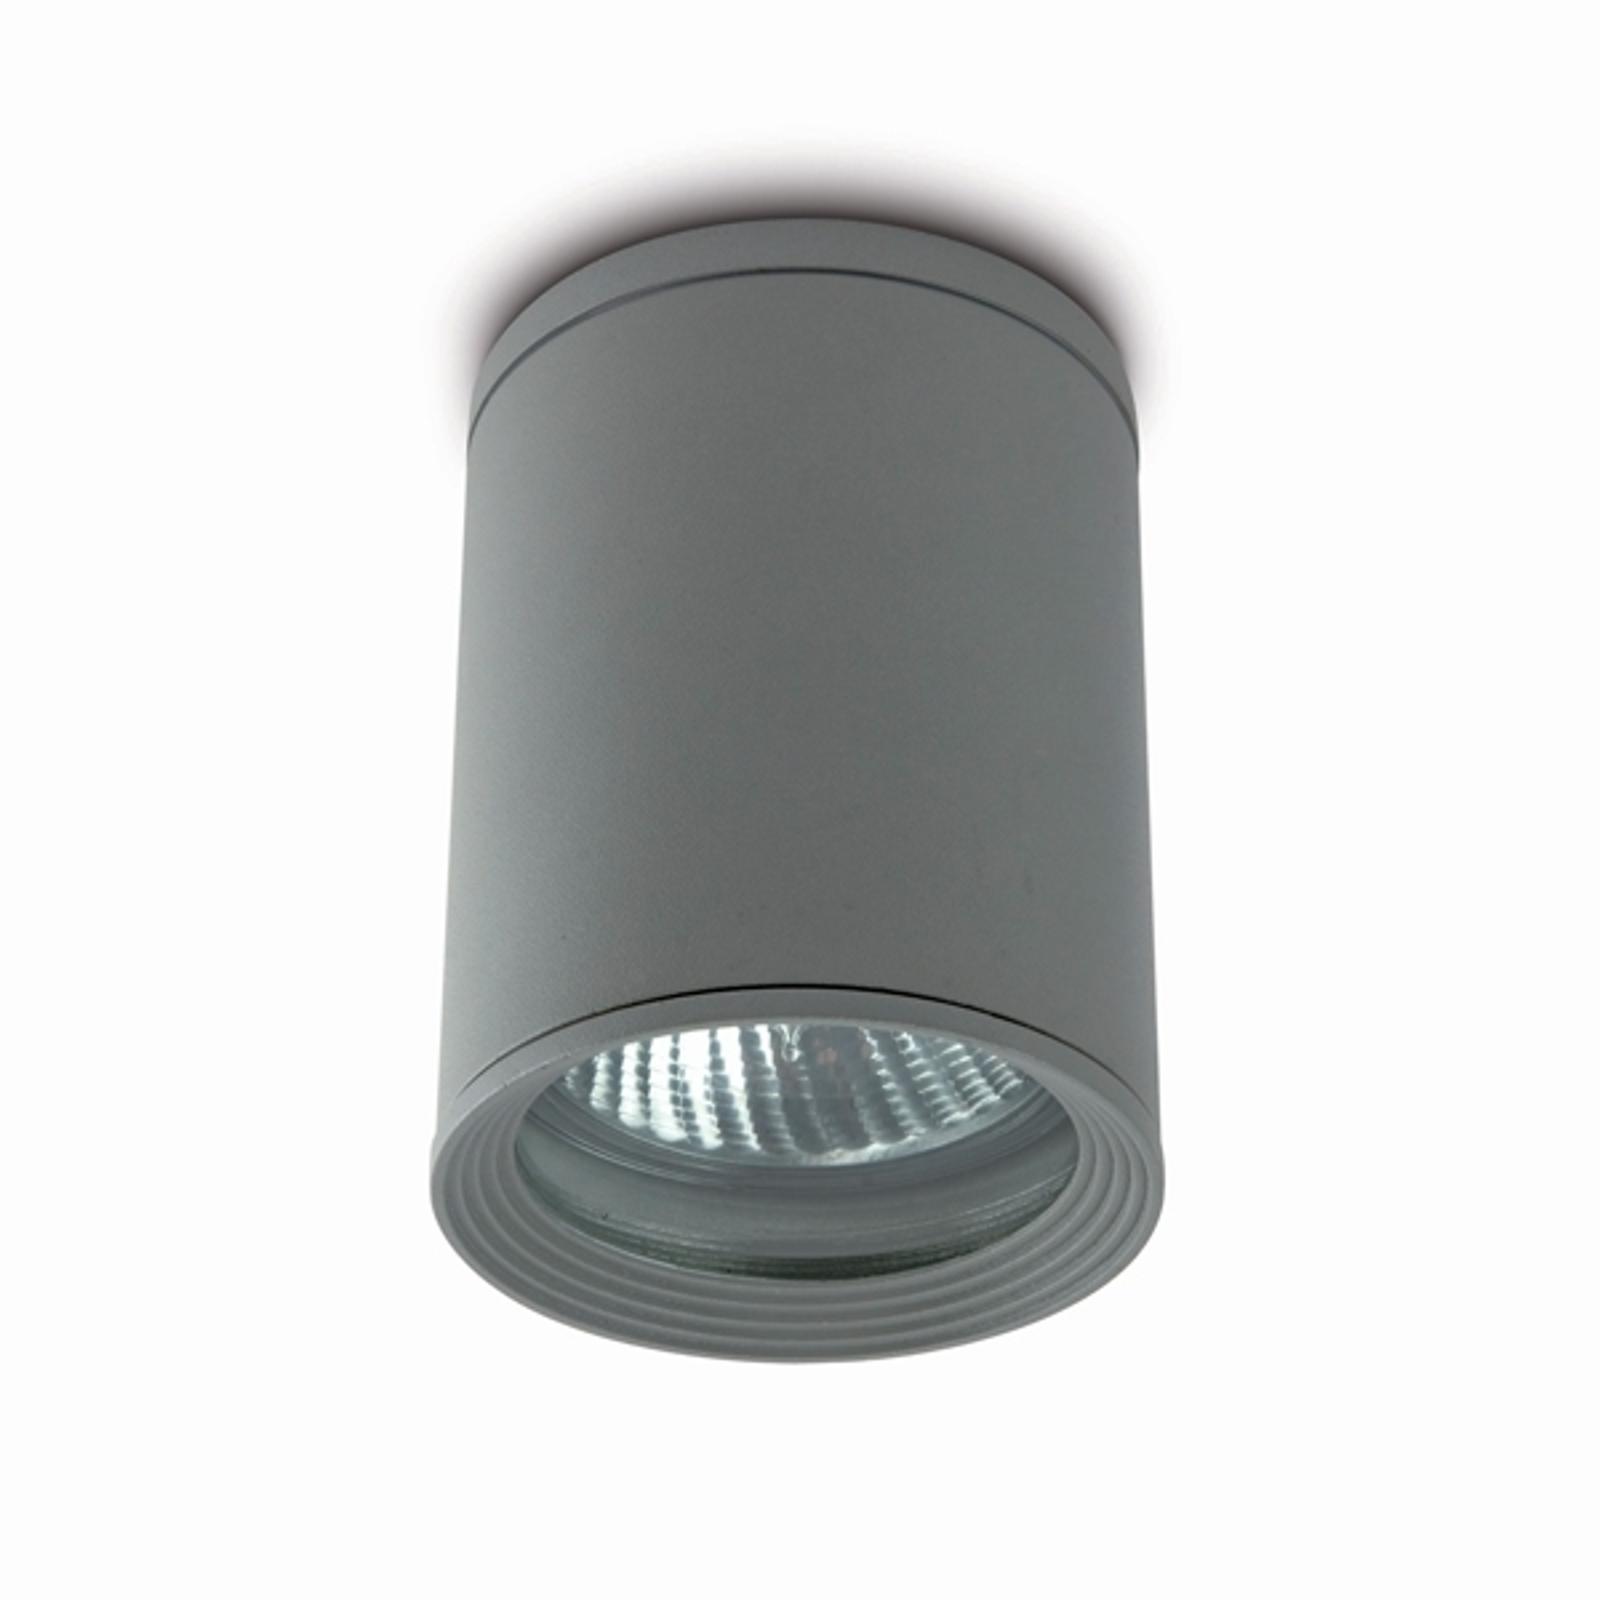 Tasa High-quality Exterior Wall Lamp_3505114_1